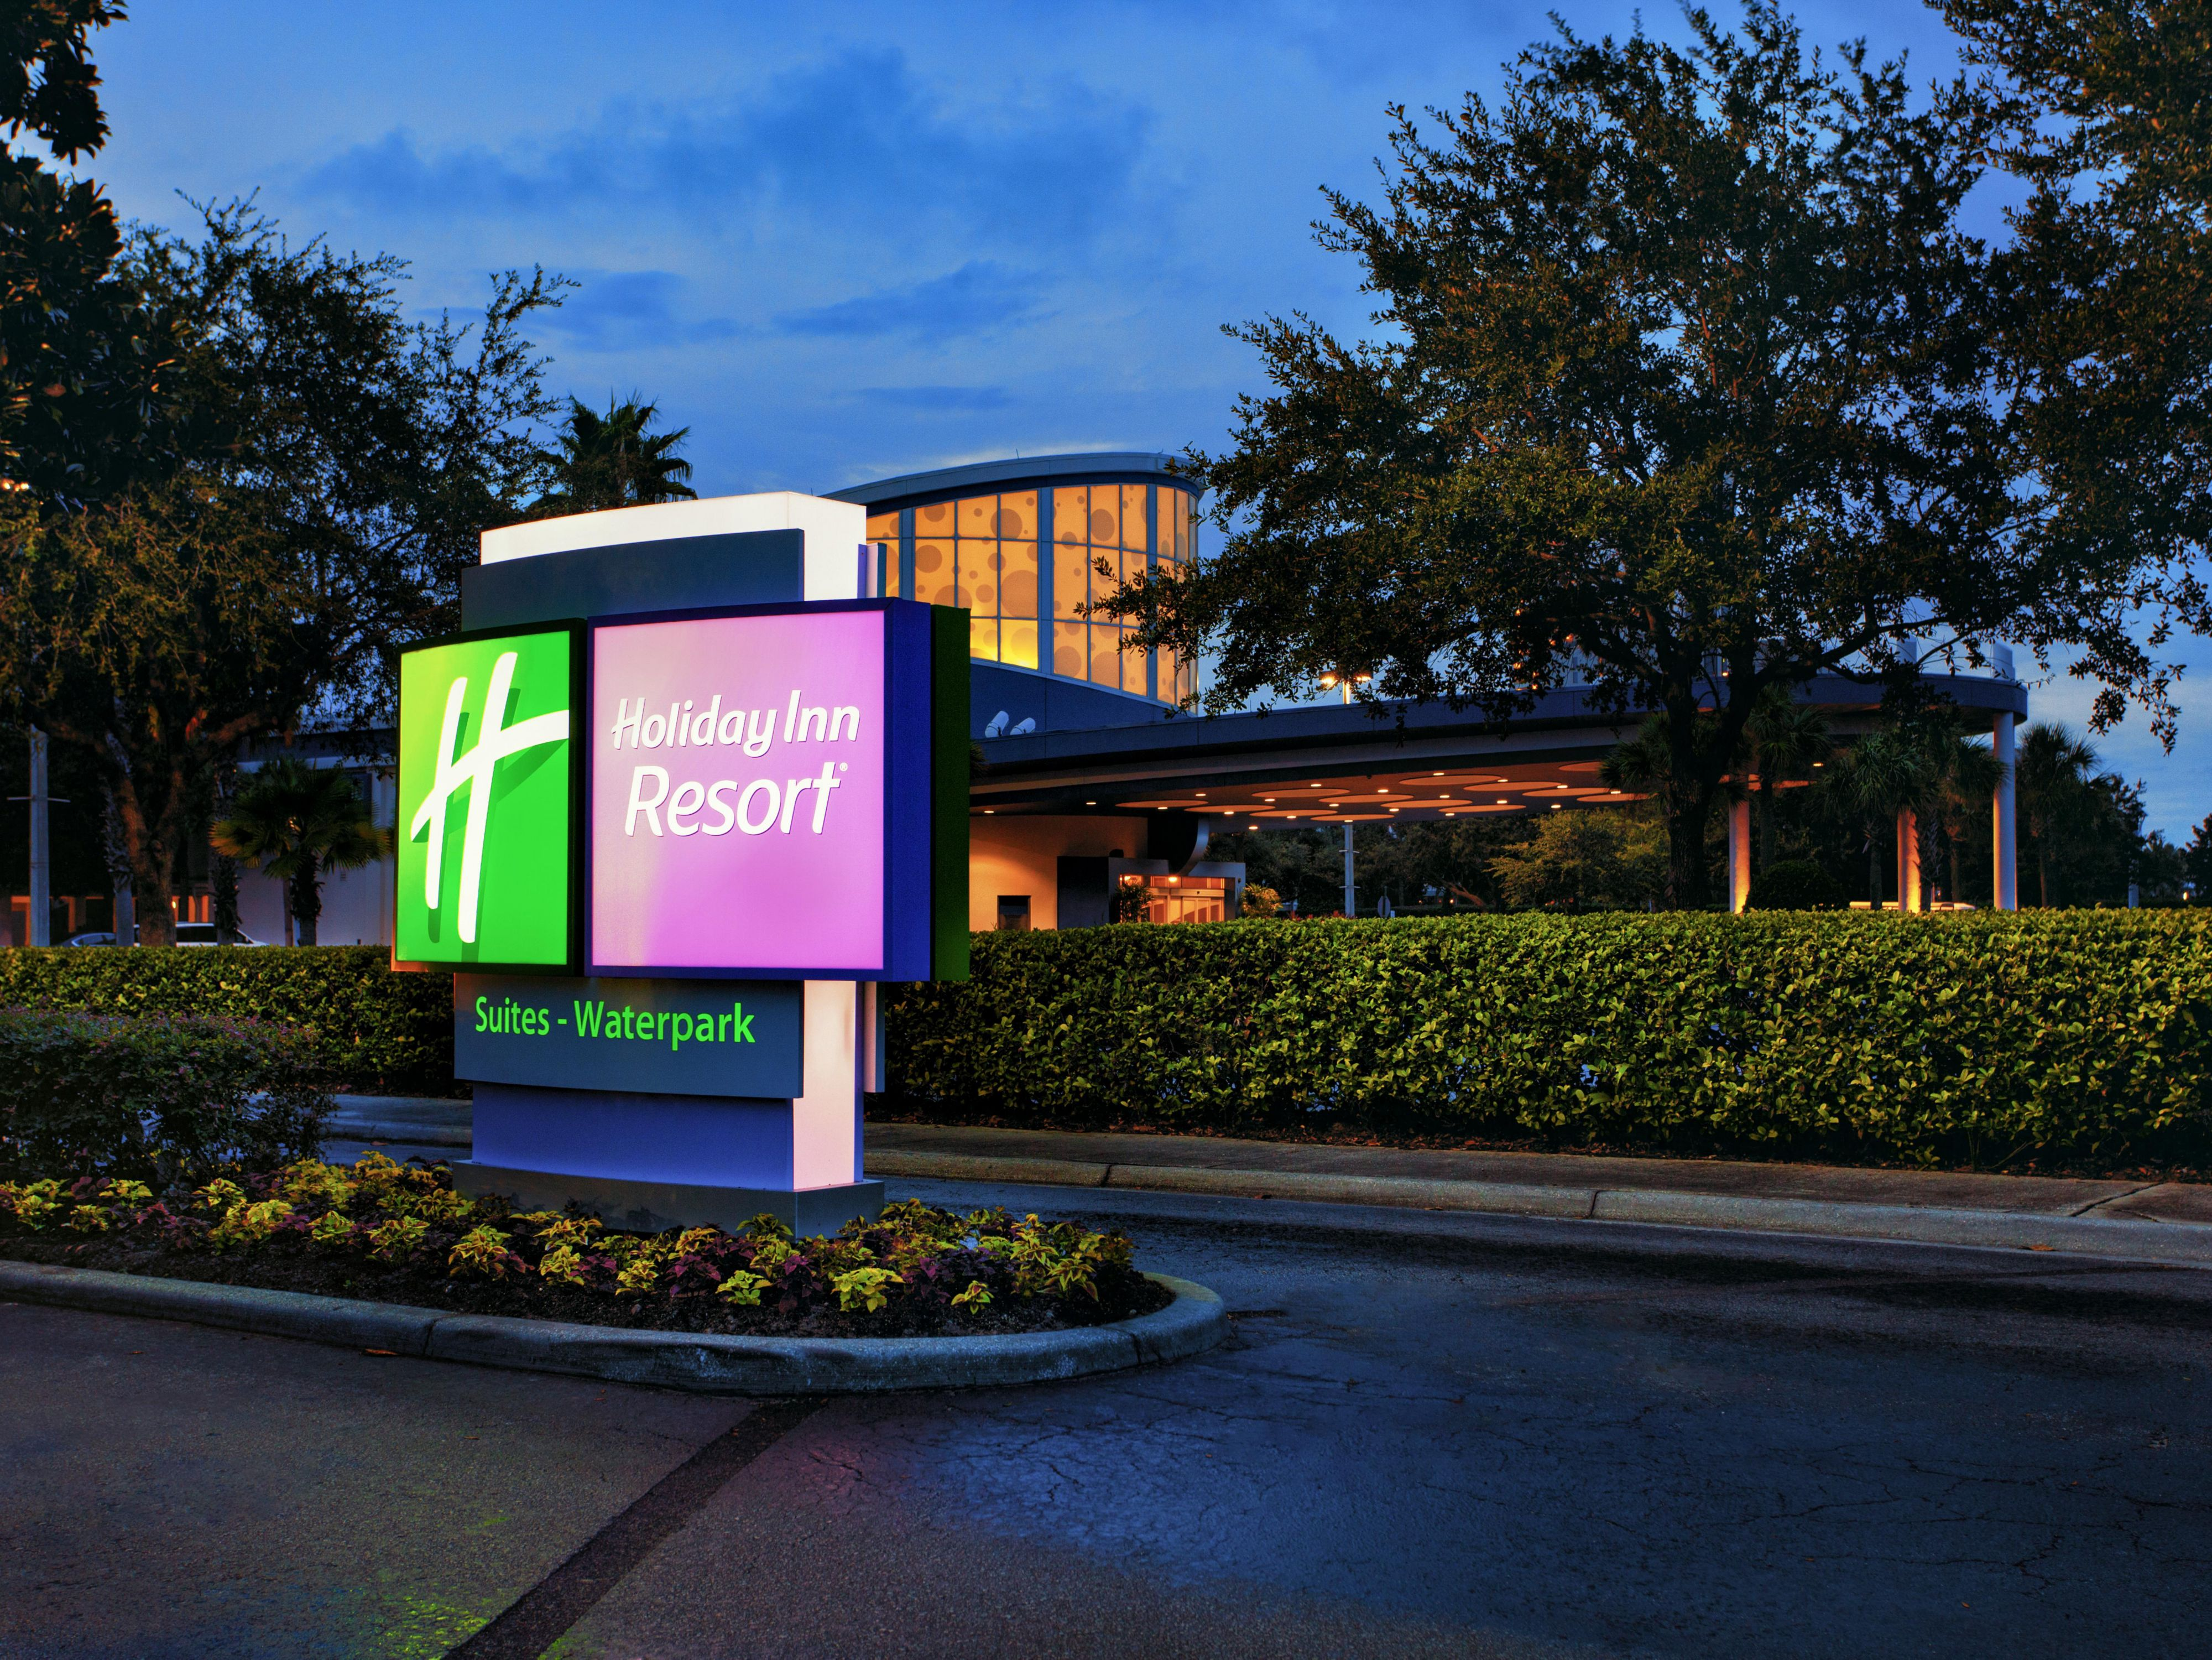 Holiday Inn Resort Orlando Suites Waterpark Hotel Reviews & s